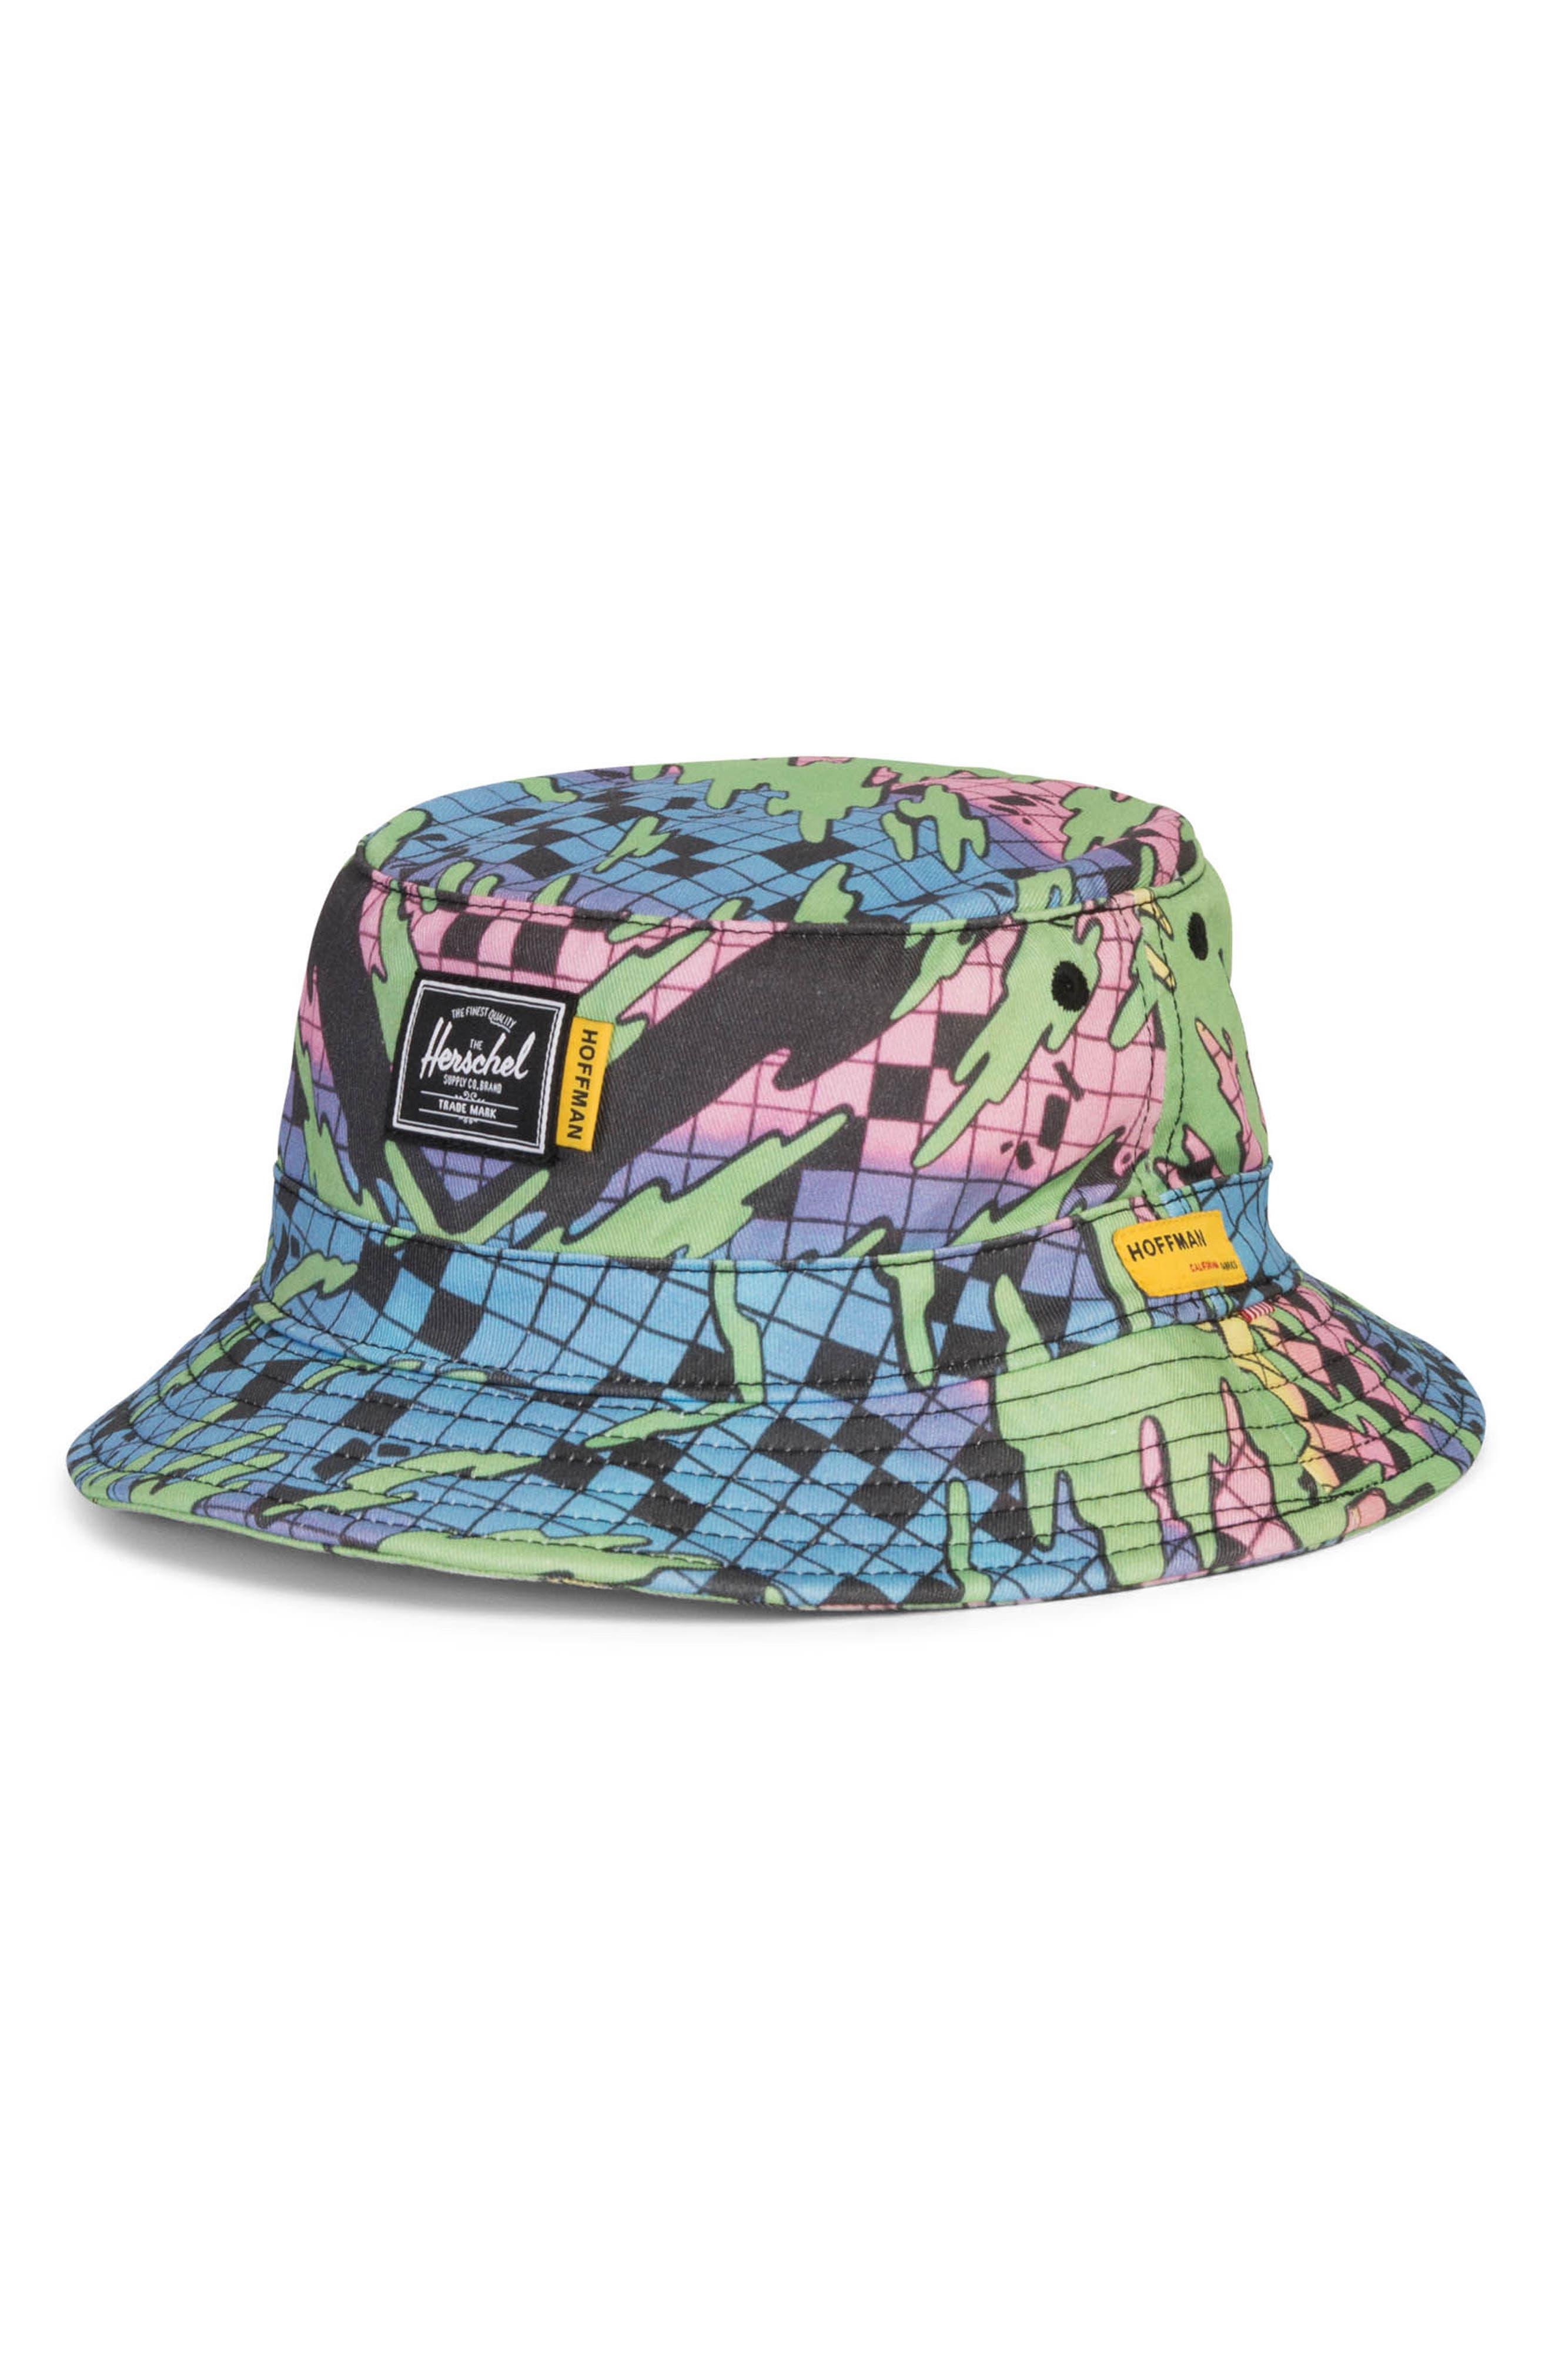 Hoffman Bucket Hat,                             Main thumbnail 1, color,                             430